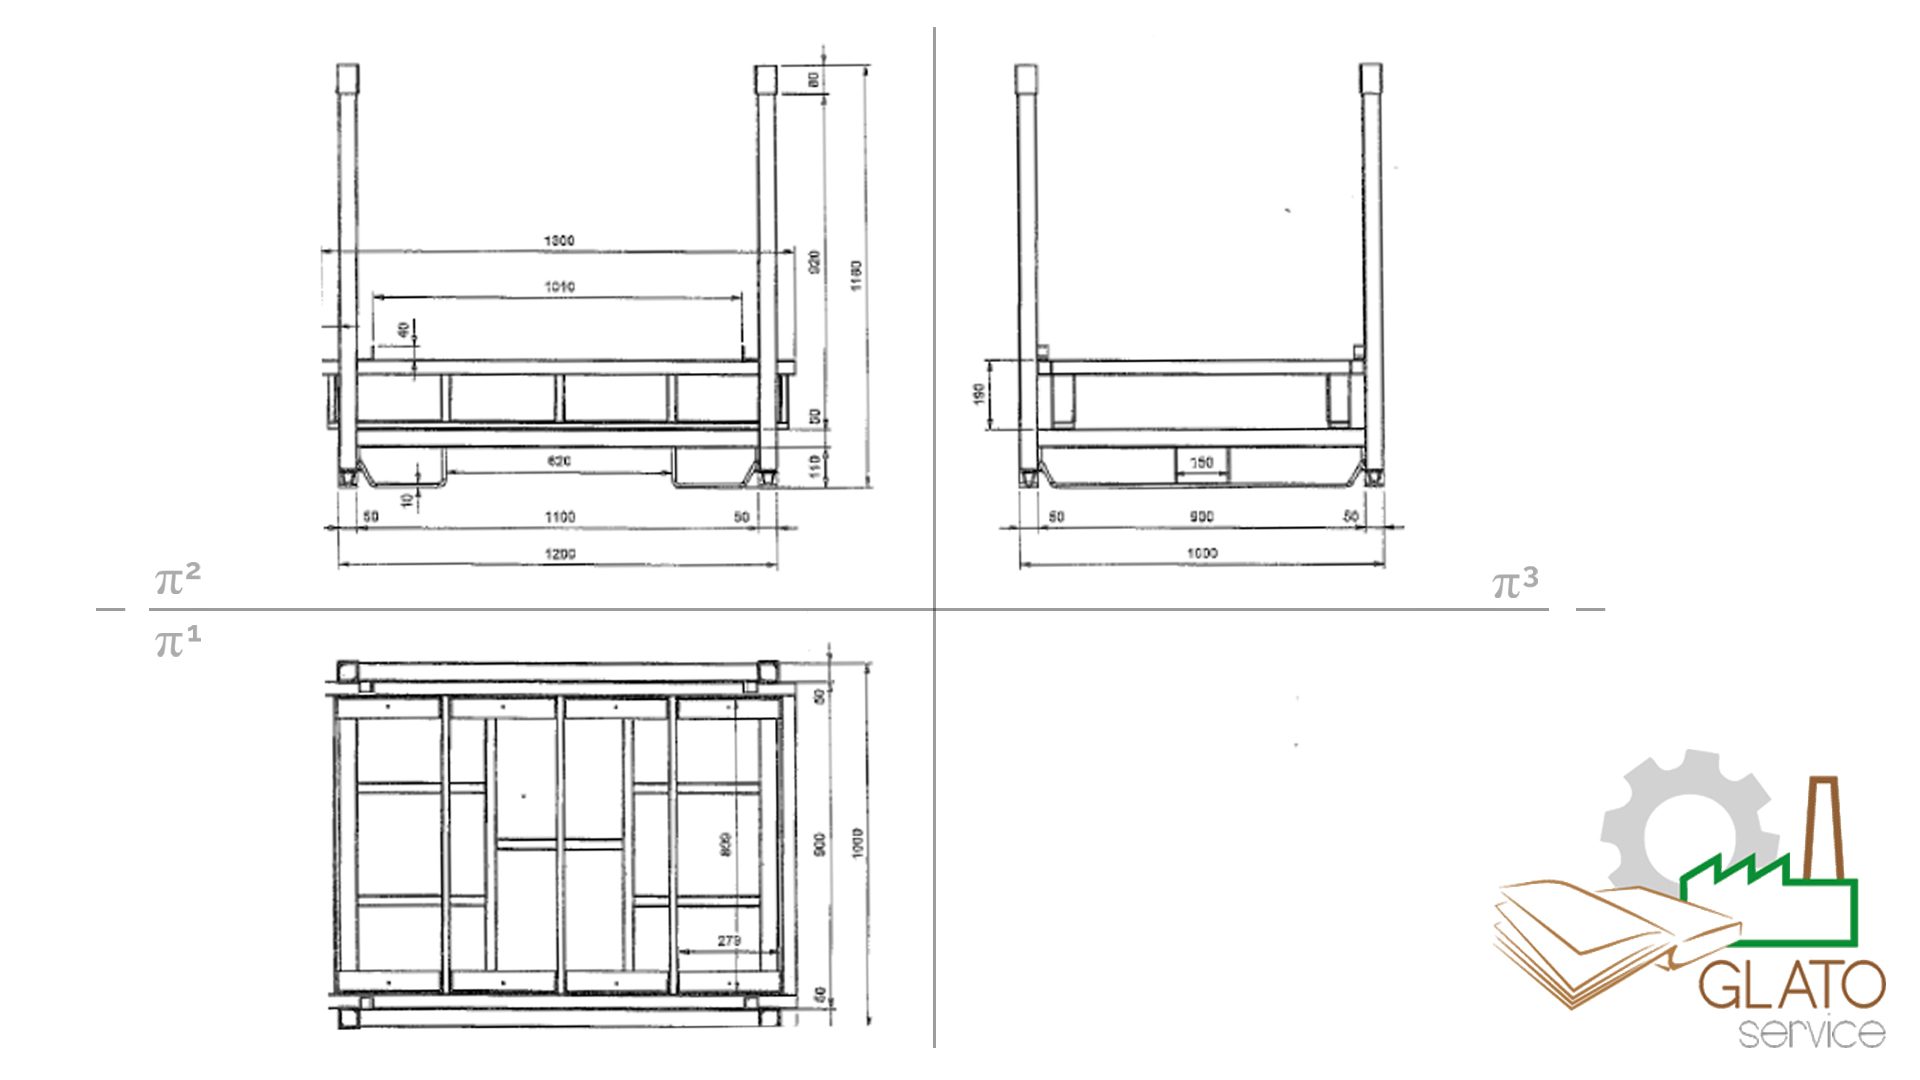 GLATOservice - orthogonal designg